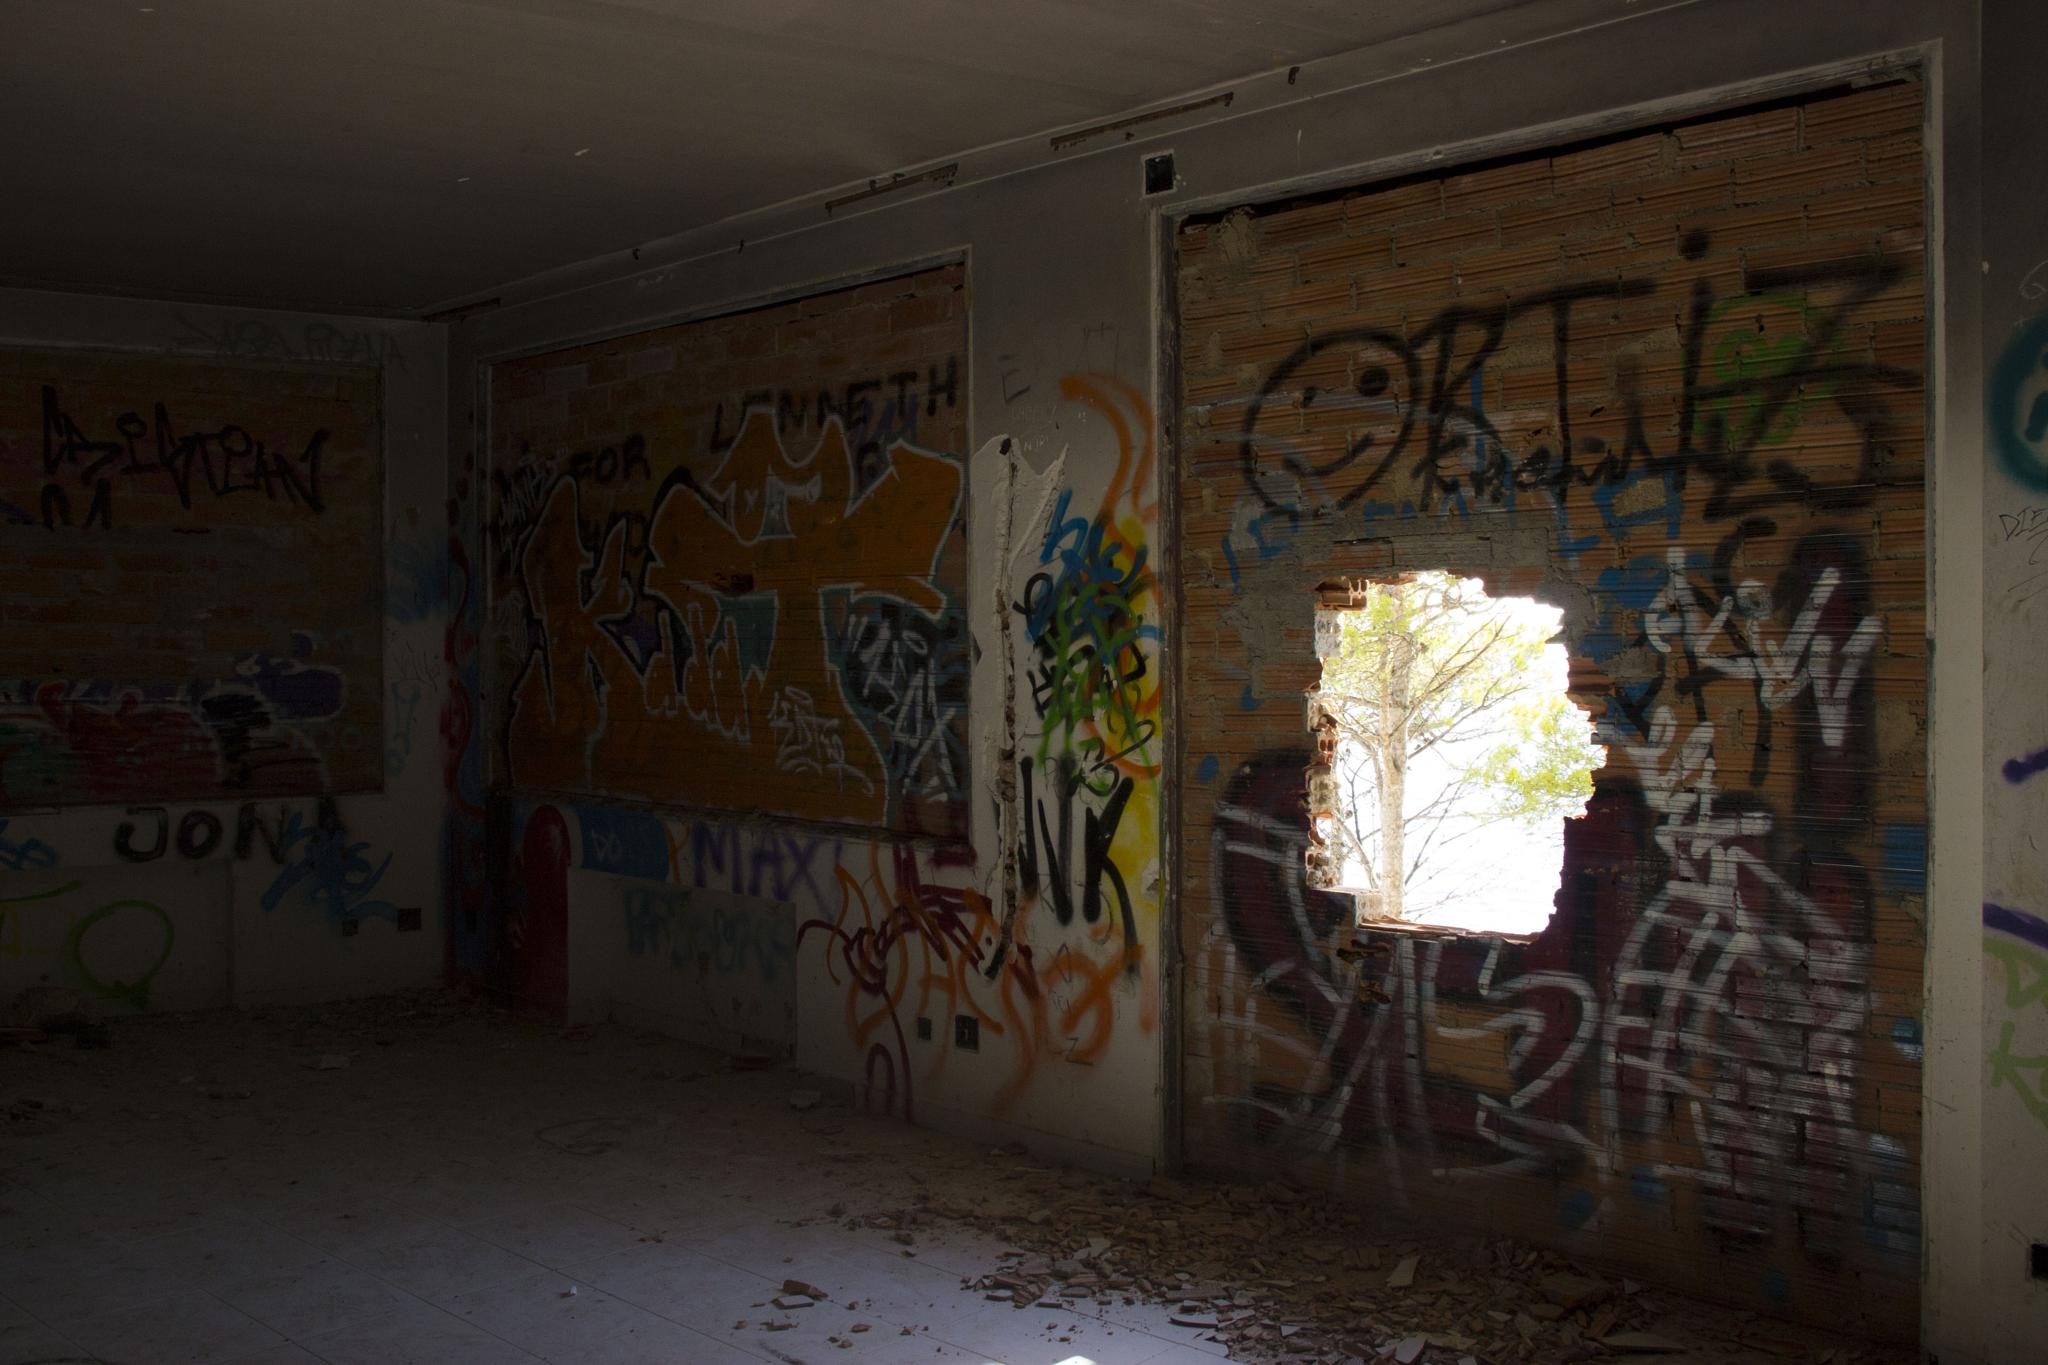 Deserted house III, Spain by Nasta